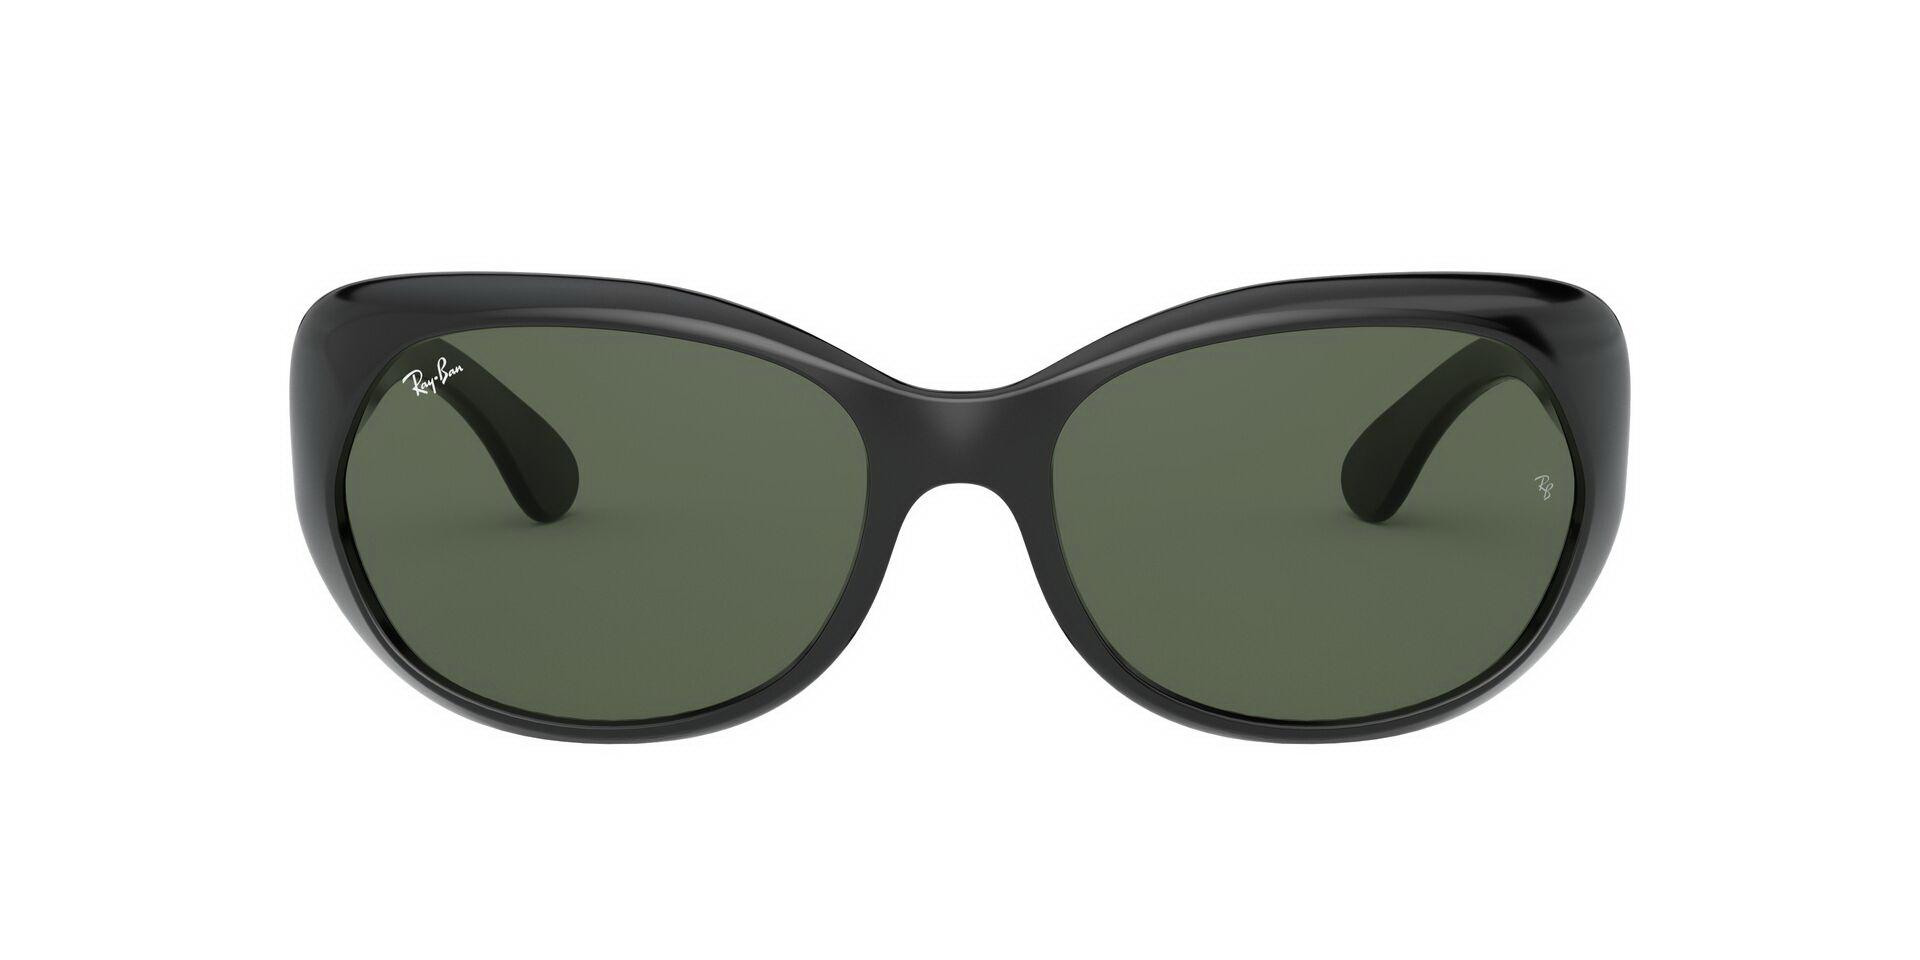 Солнцезащитные очки Очки с/з Ray Ban 0RB4325 601/71